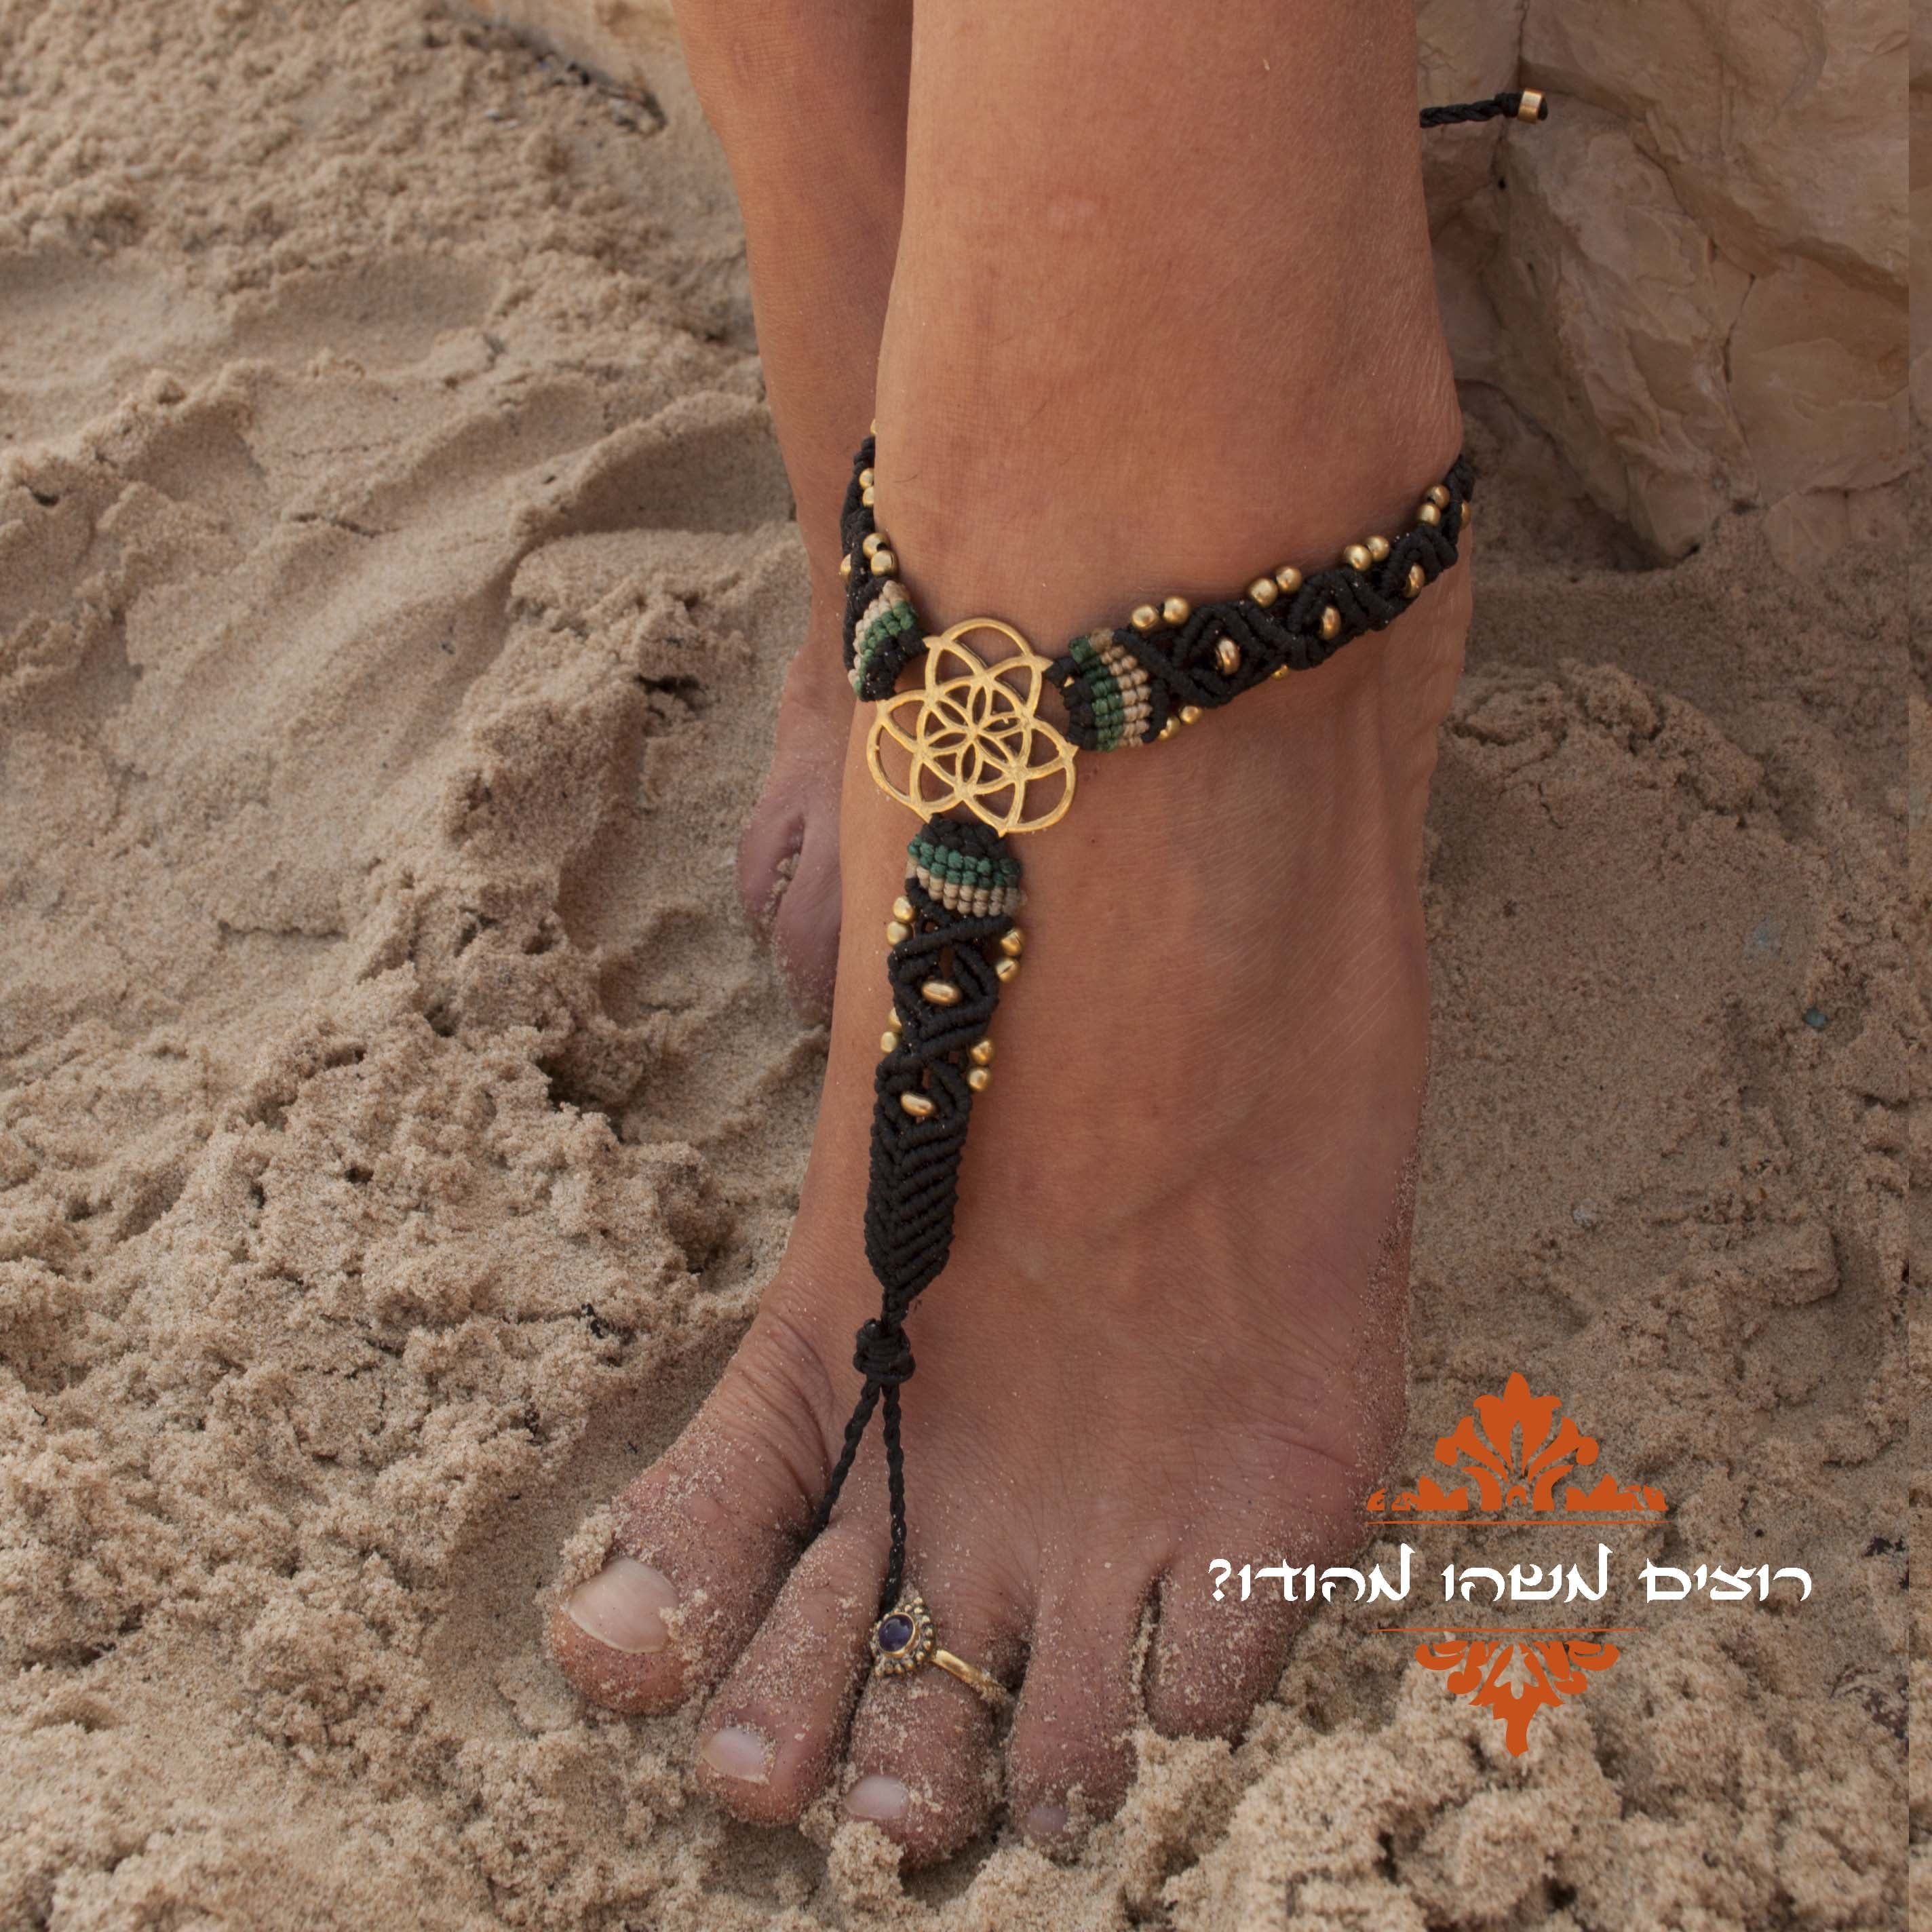 barefoot מקרמה זרע החיים שחור